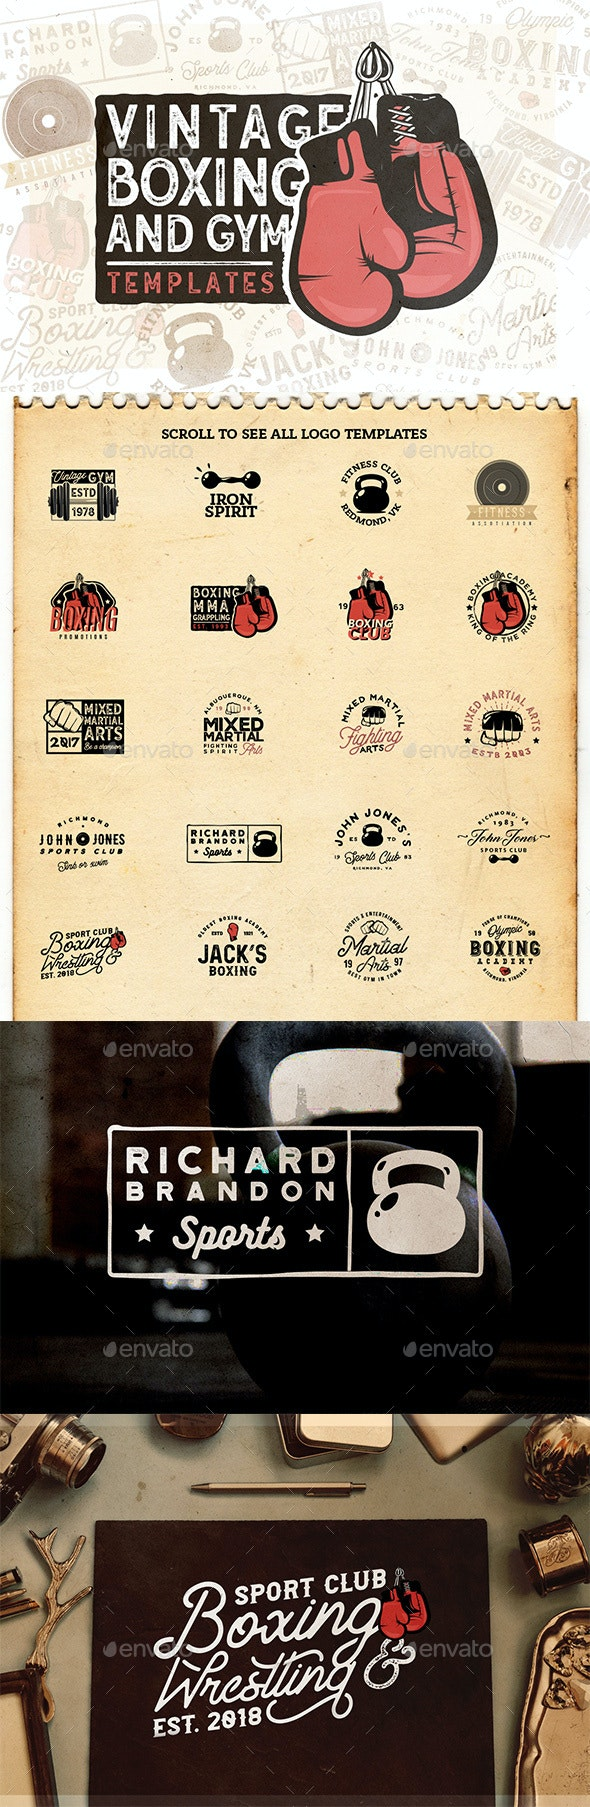 20 Vintage Boxing & Gym Badges - Badges & Stickers Web Elements